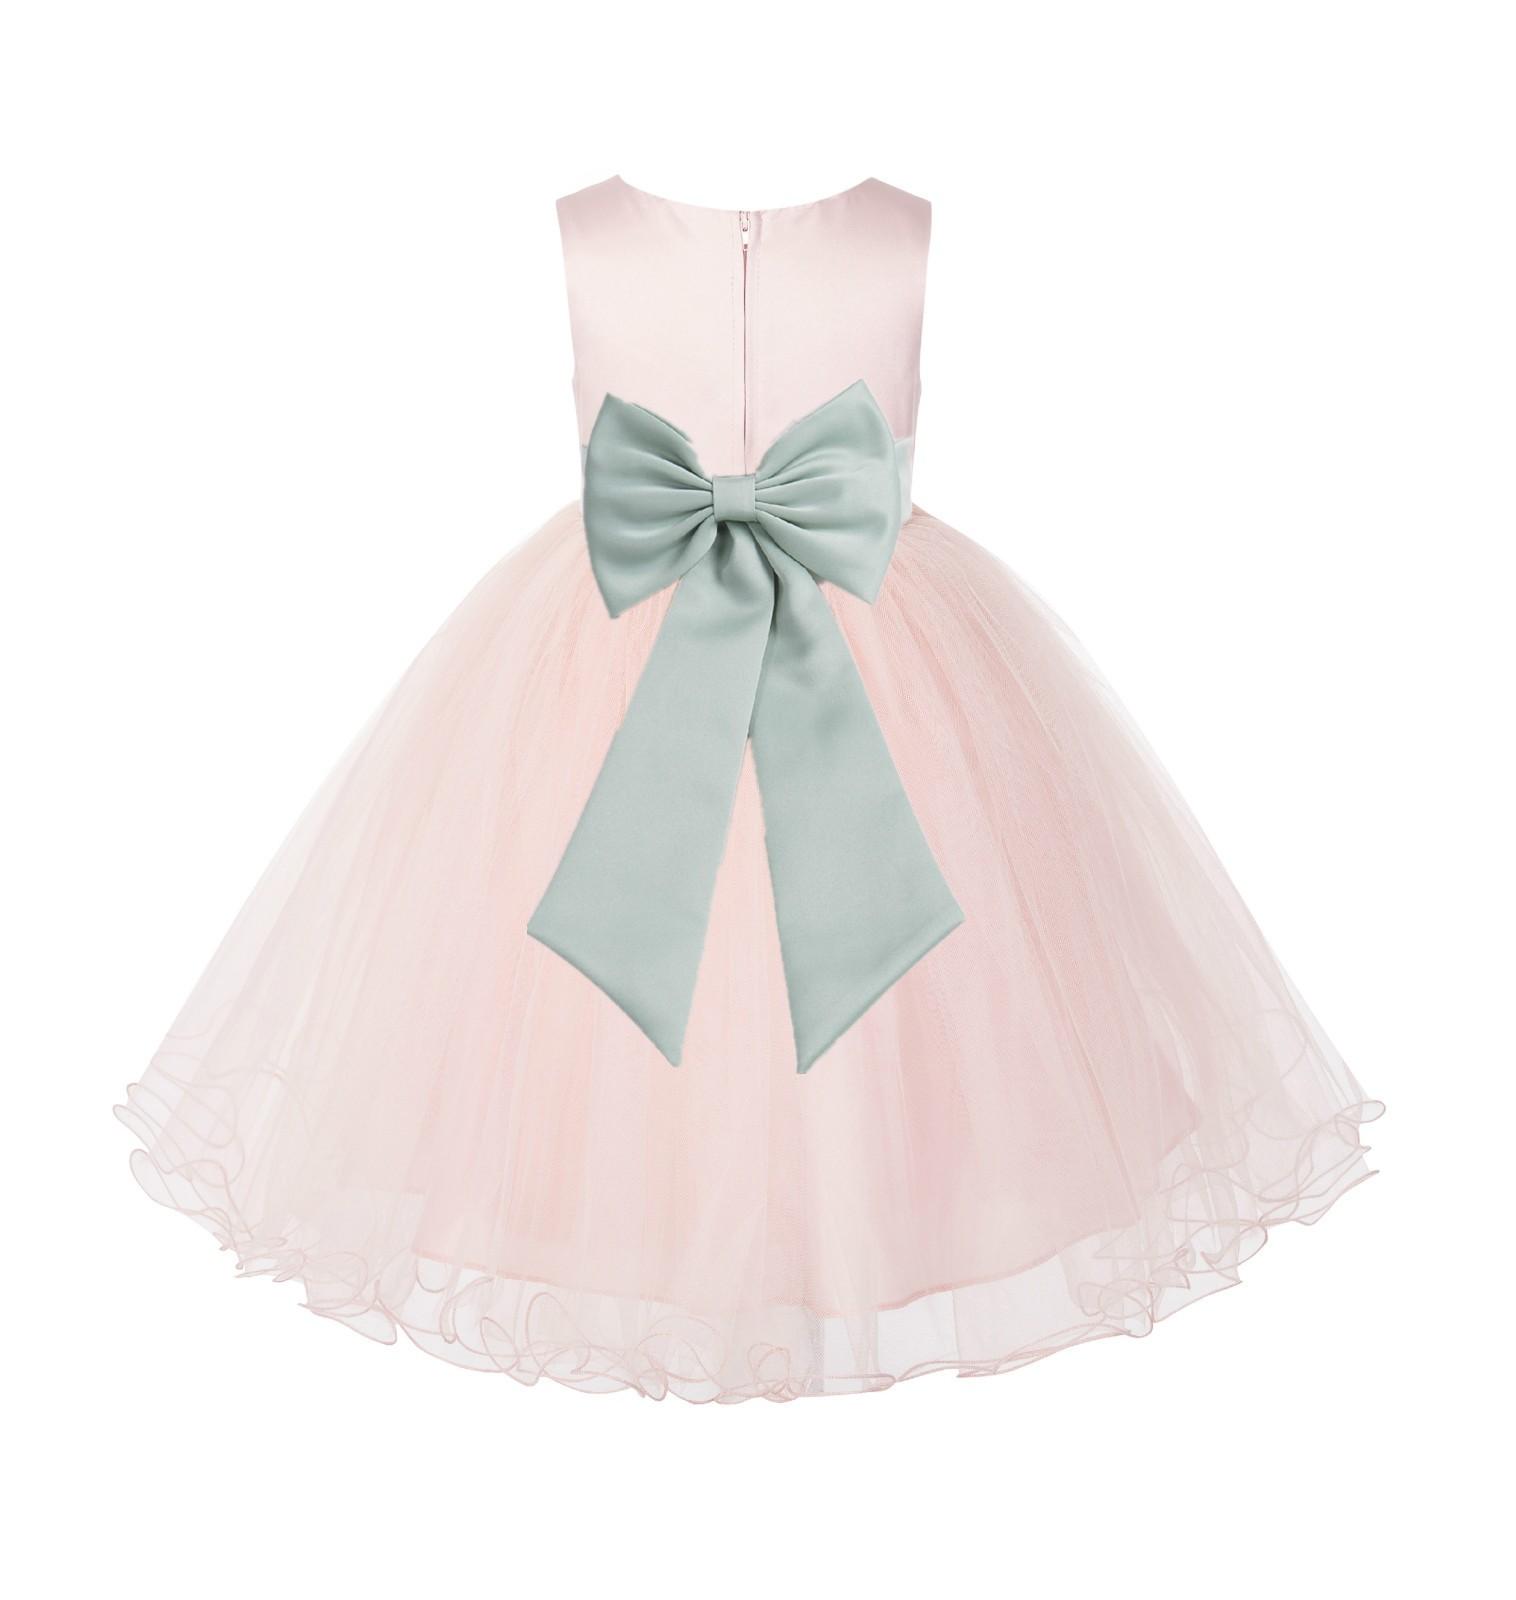 Blush PInk / Sage Tulle Rattail Edge Flower Girl Dress Wedding Bridesmaid 829T